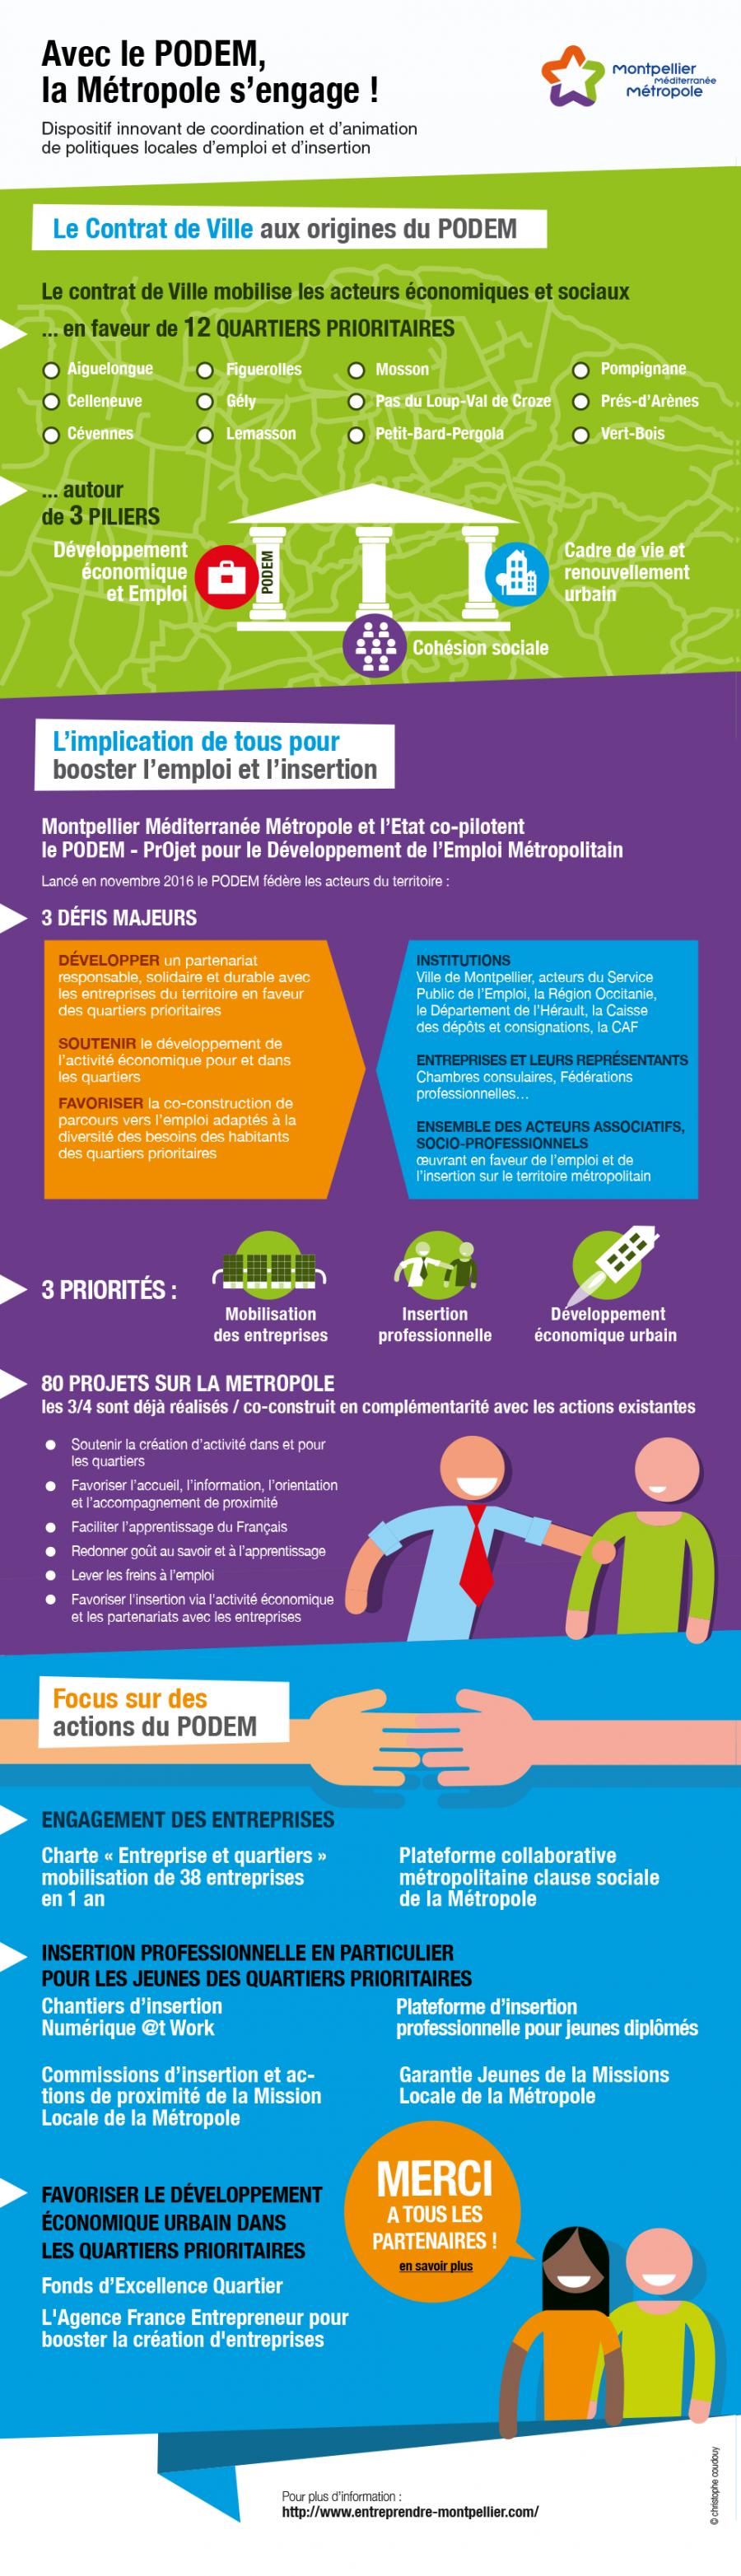 Infographie Podem 2018